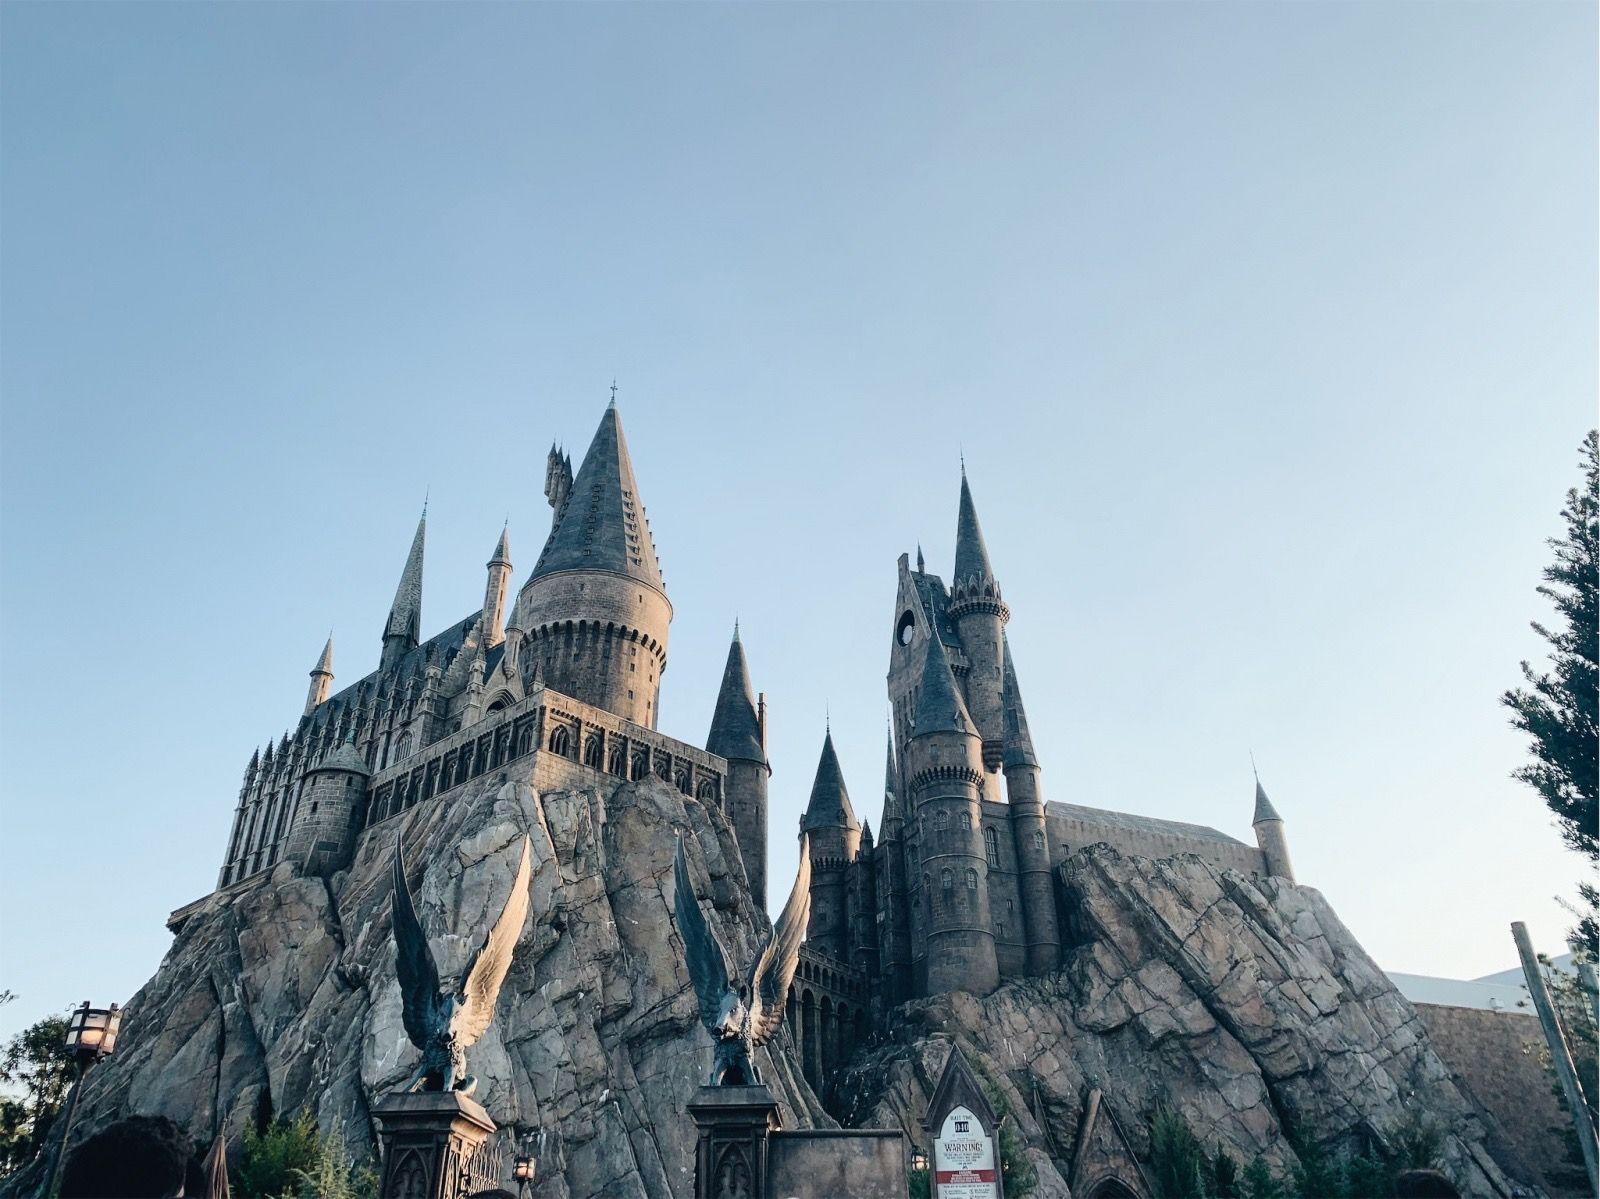 Hogwarts Castle Universal Studios Orlando Islands Of Adventure Theme Park Universal Studios Orlando Hogwarts Castle Slytherin Aesthetic